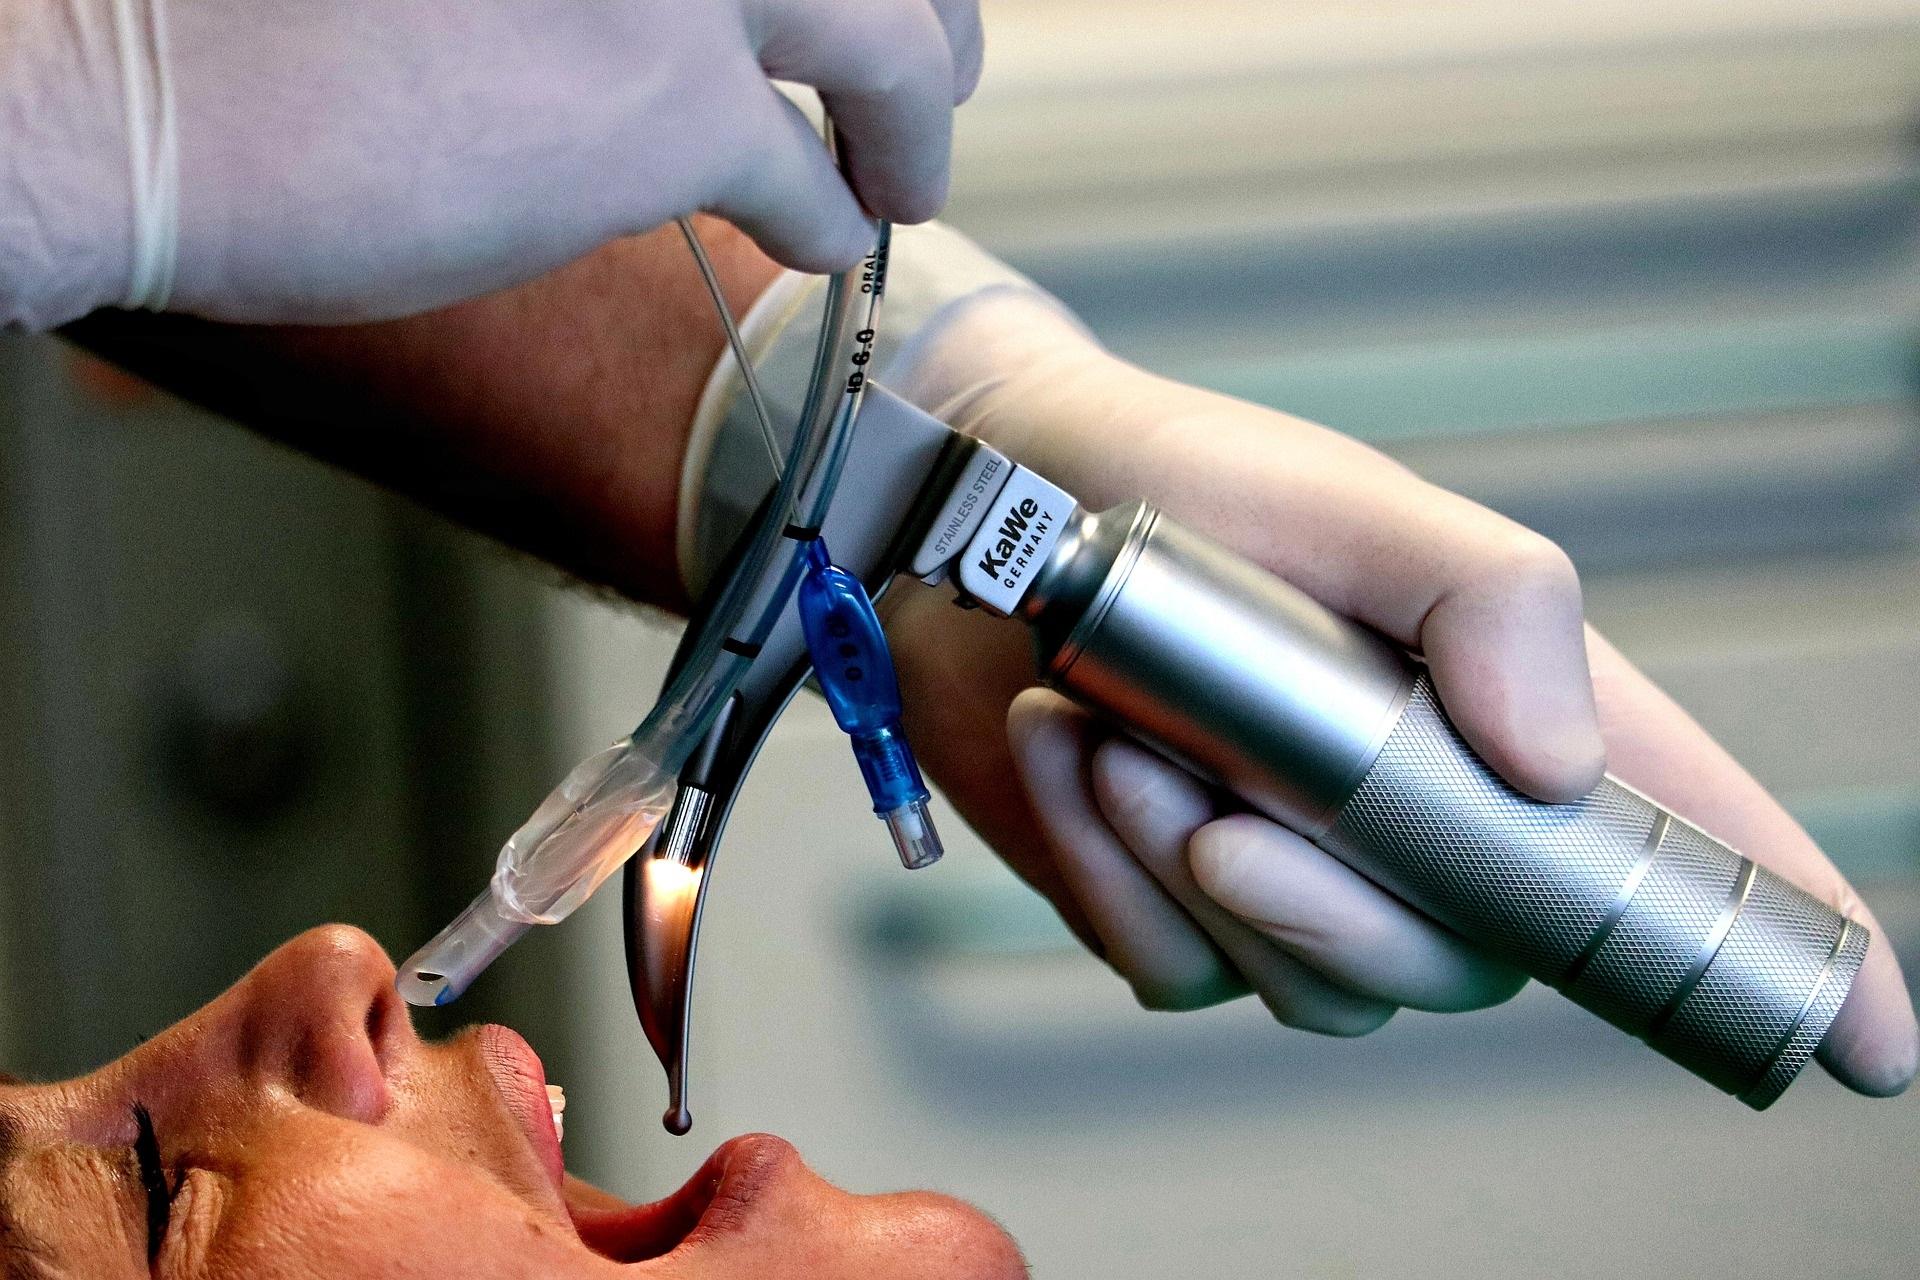 Healthcare professional using a laryngoscope